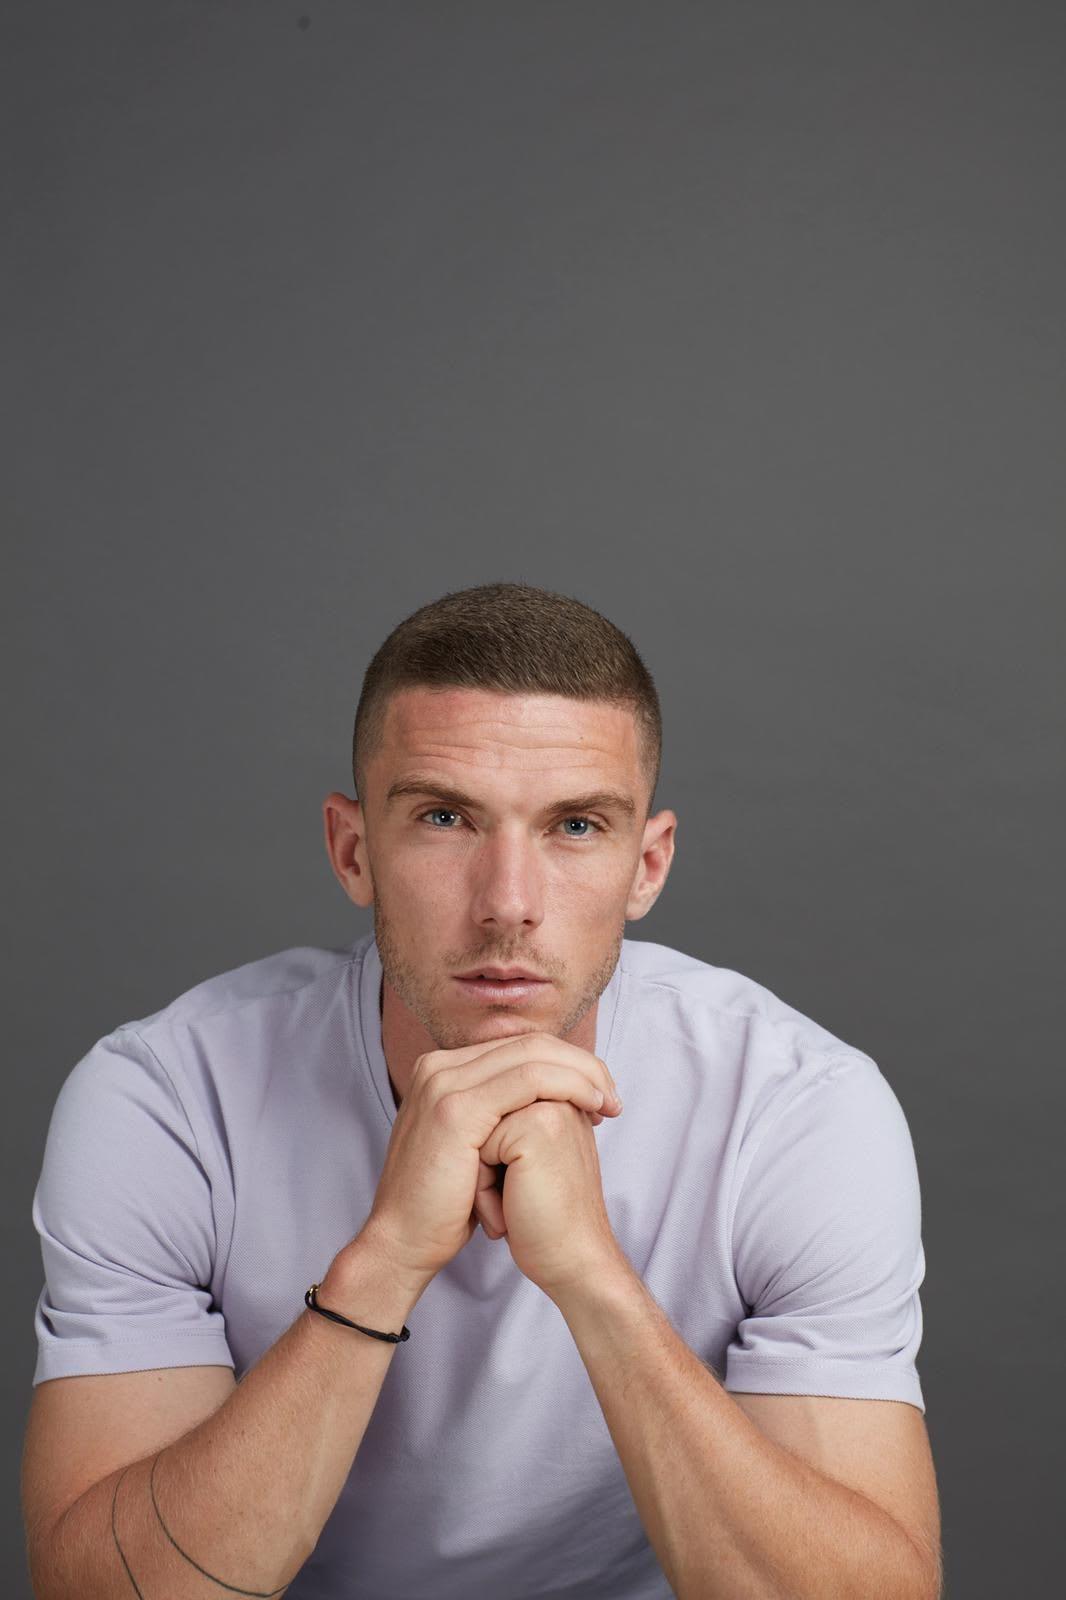 Portrait of Caucasian man wearing grey t-shirt, Robin Gosens, footballer, football, German, Germany, team, adidas, sports, exercise, DFB